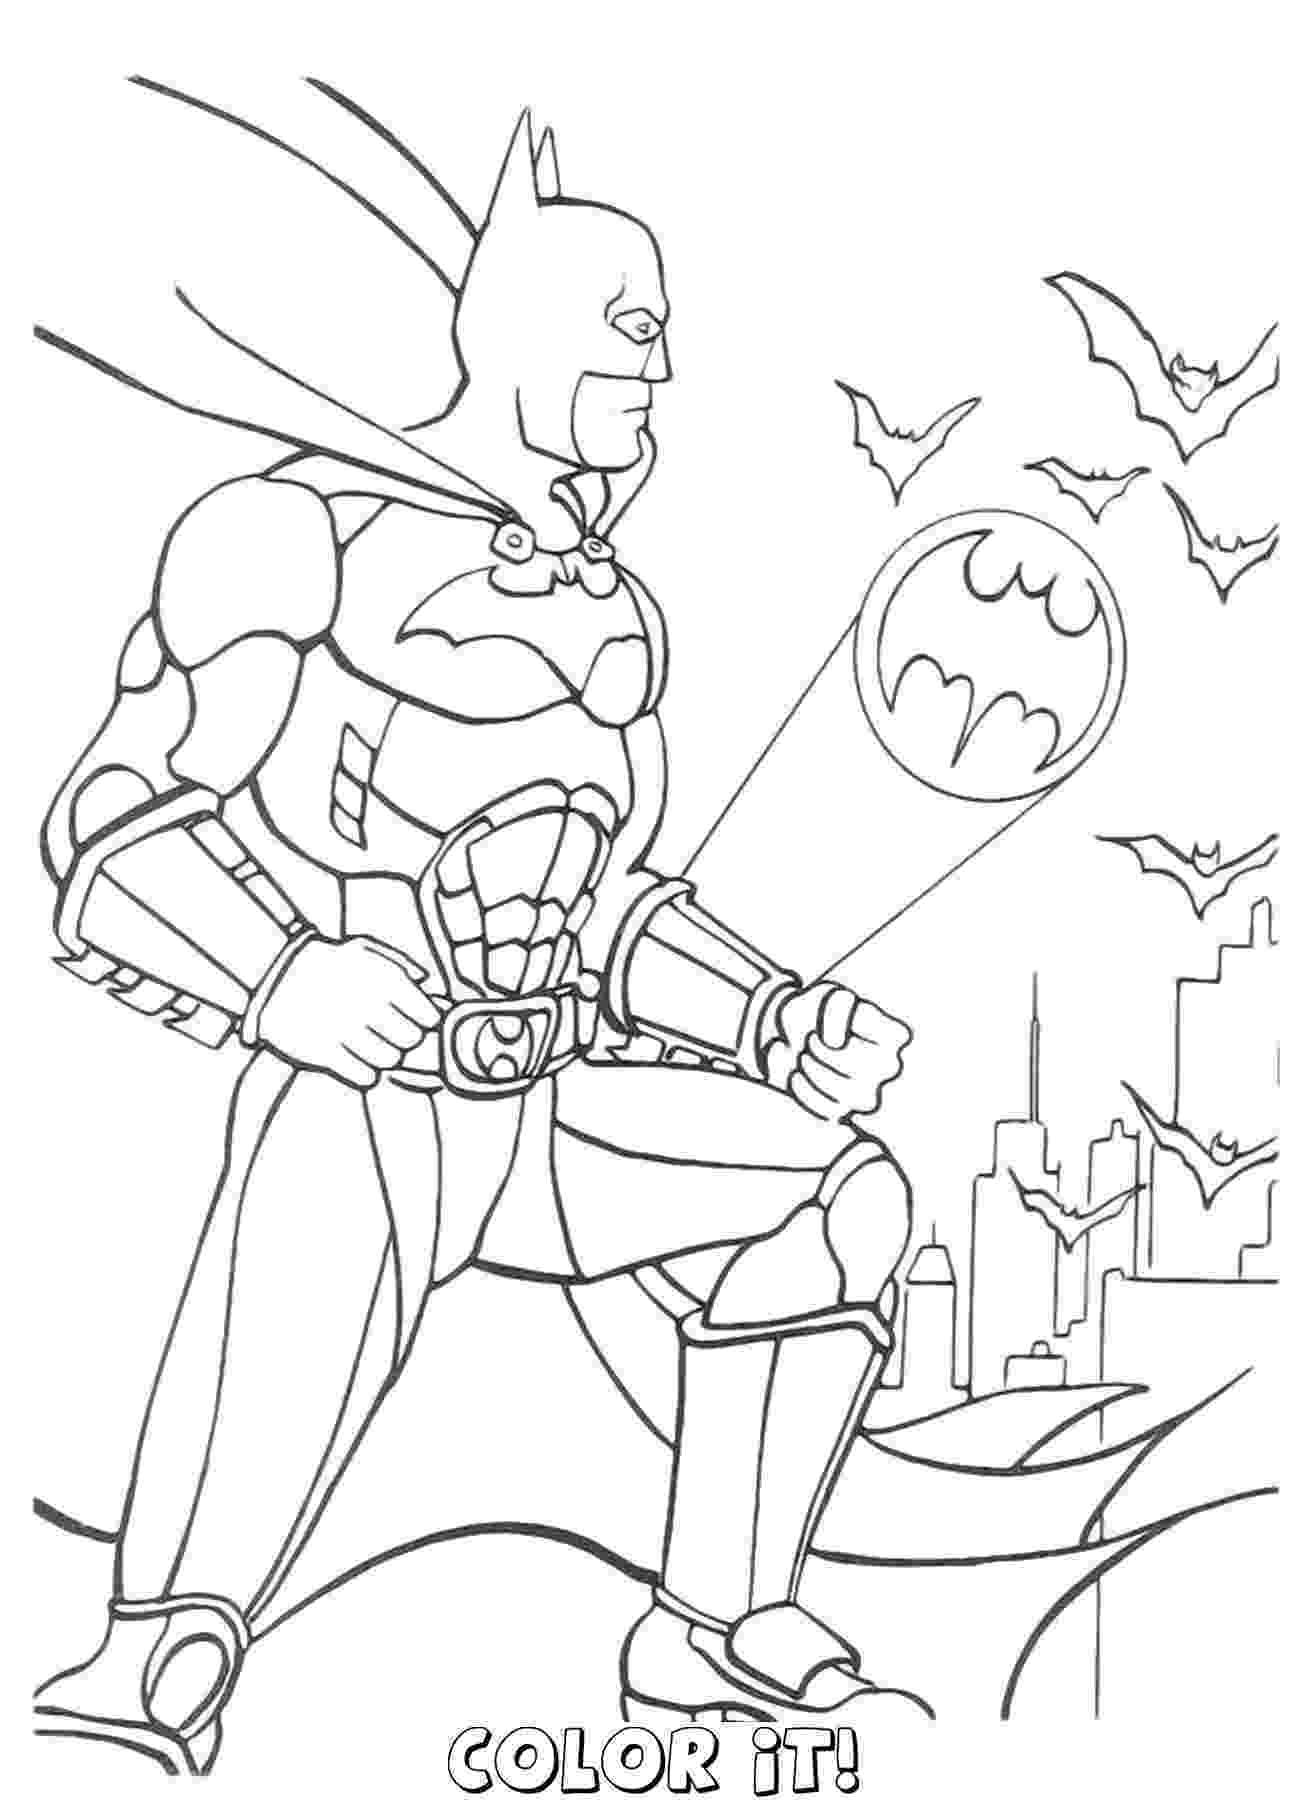 printable batman coloring pages batman free downloadable coloring pages batman printable